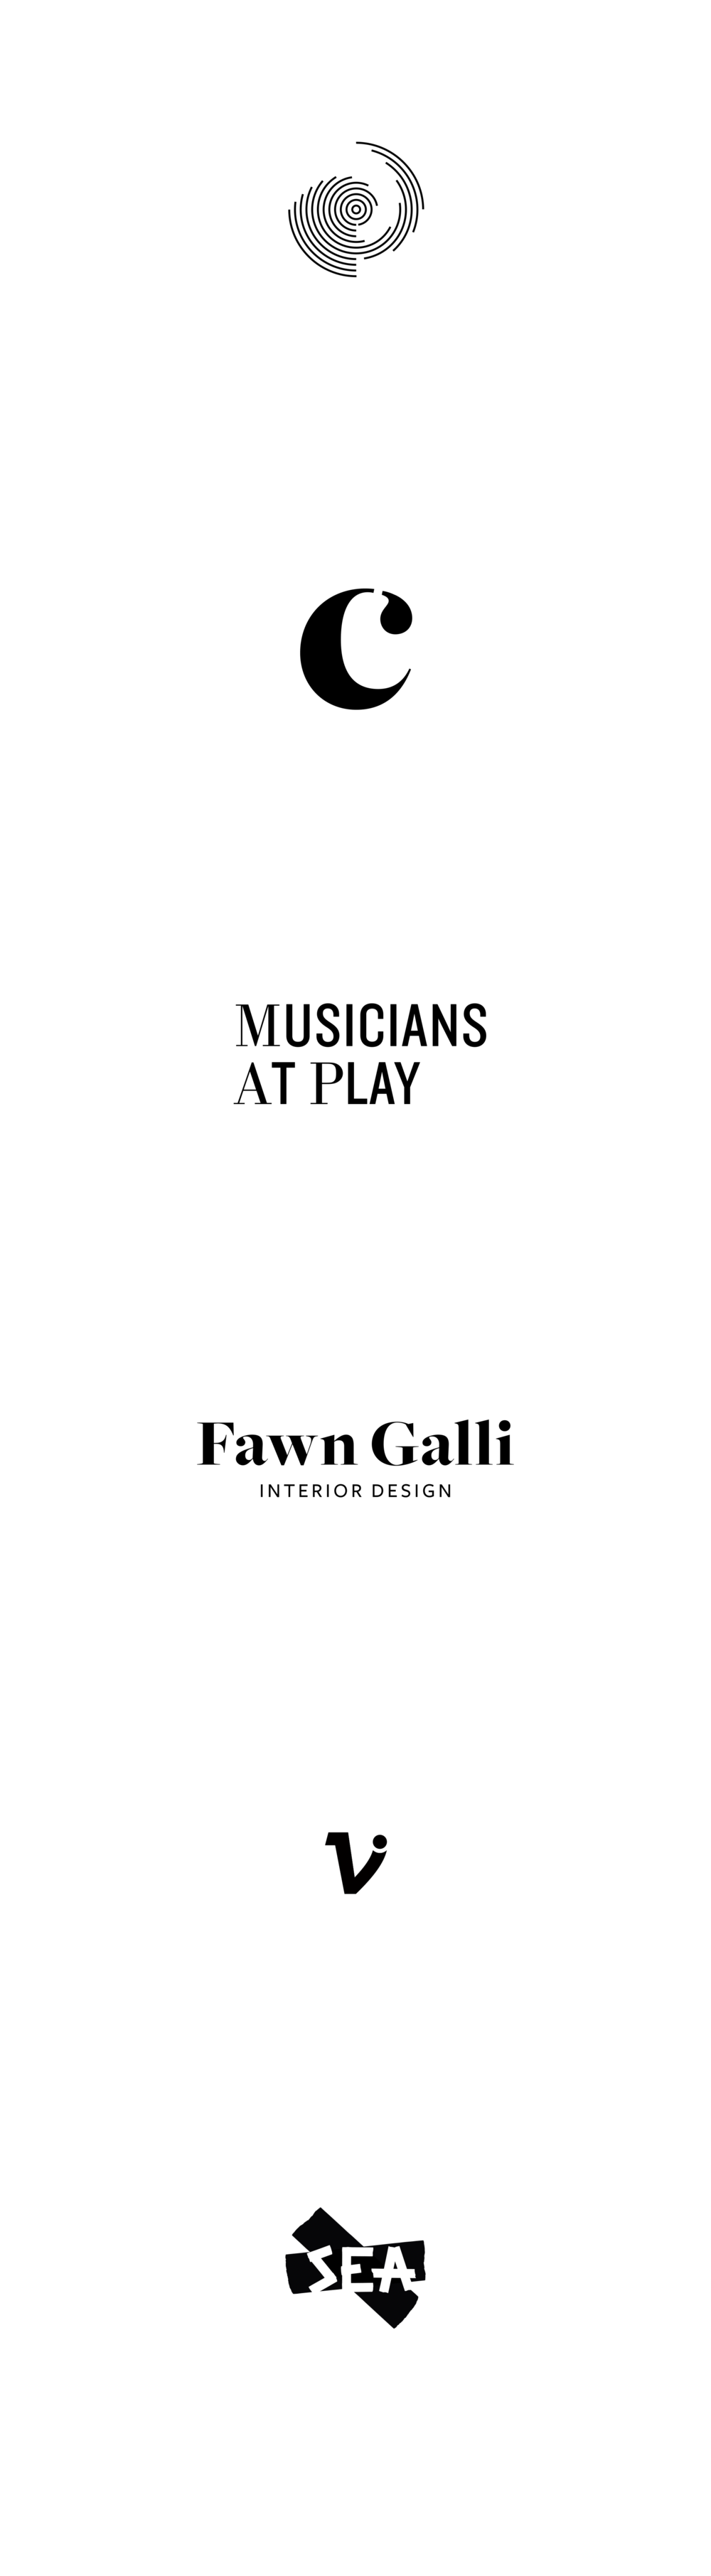 LB_logos